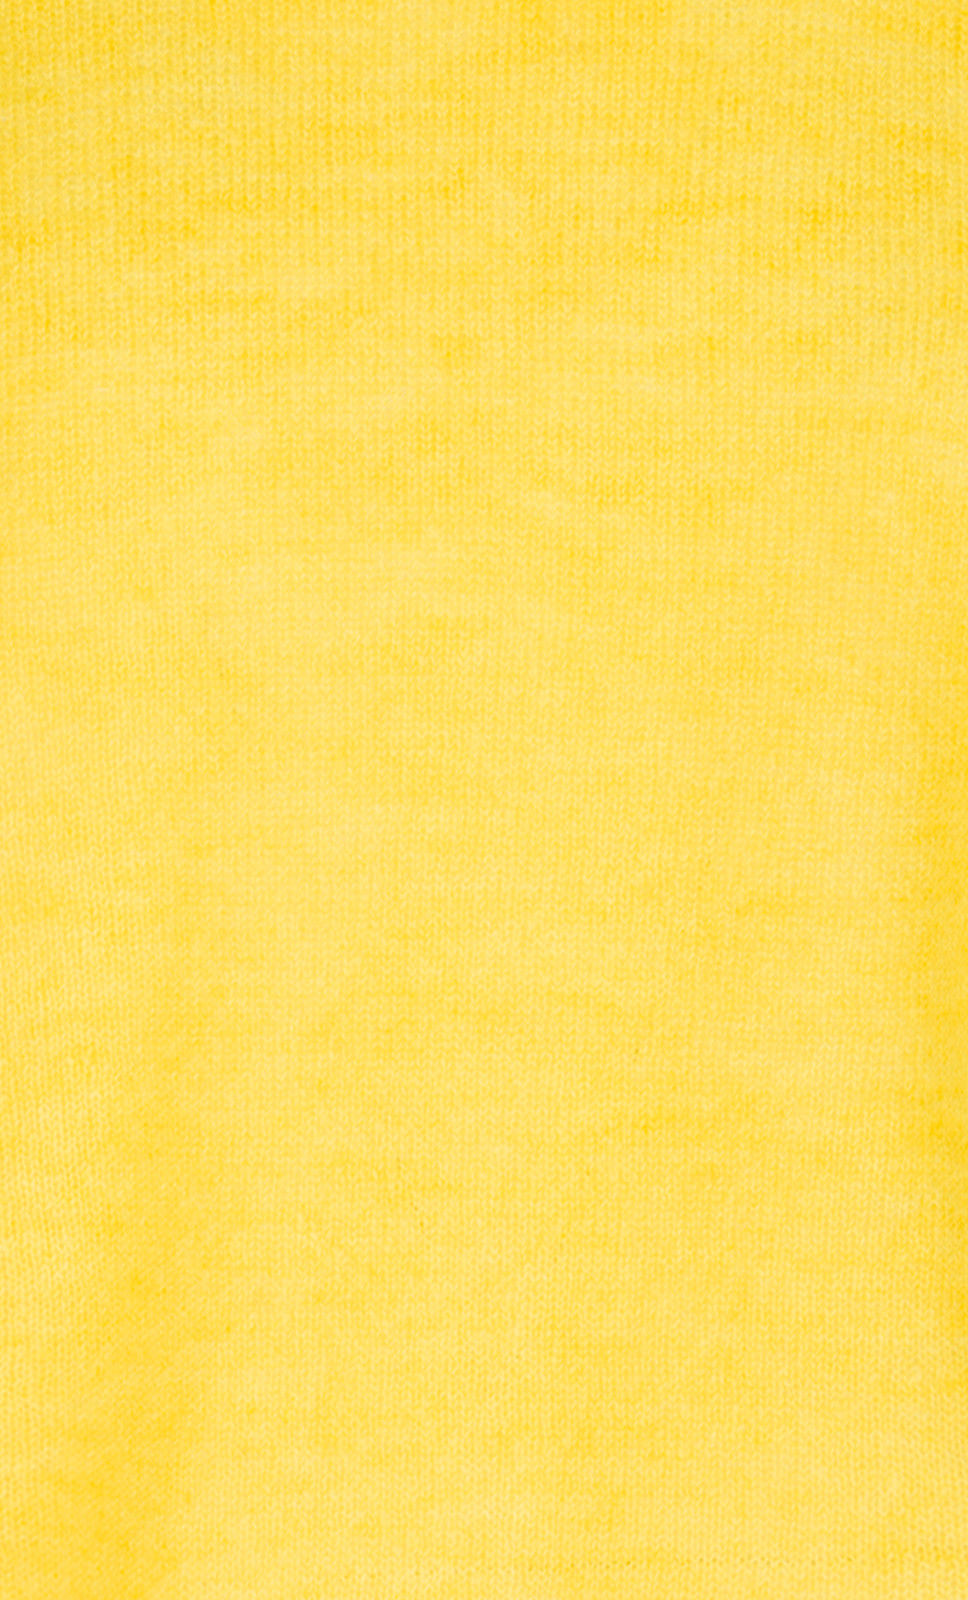 Fluffy-Bright-Yellow